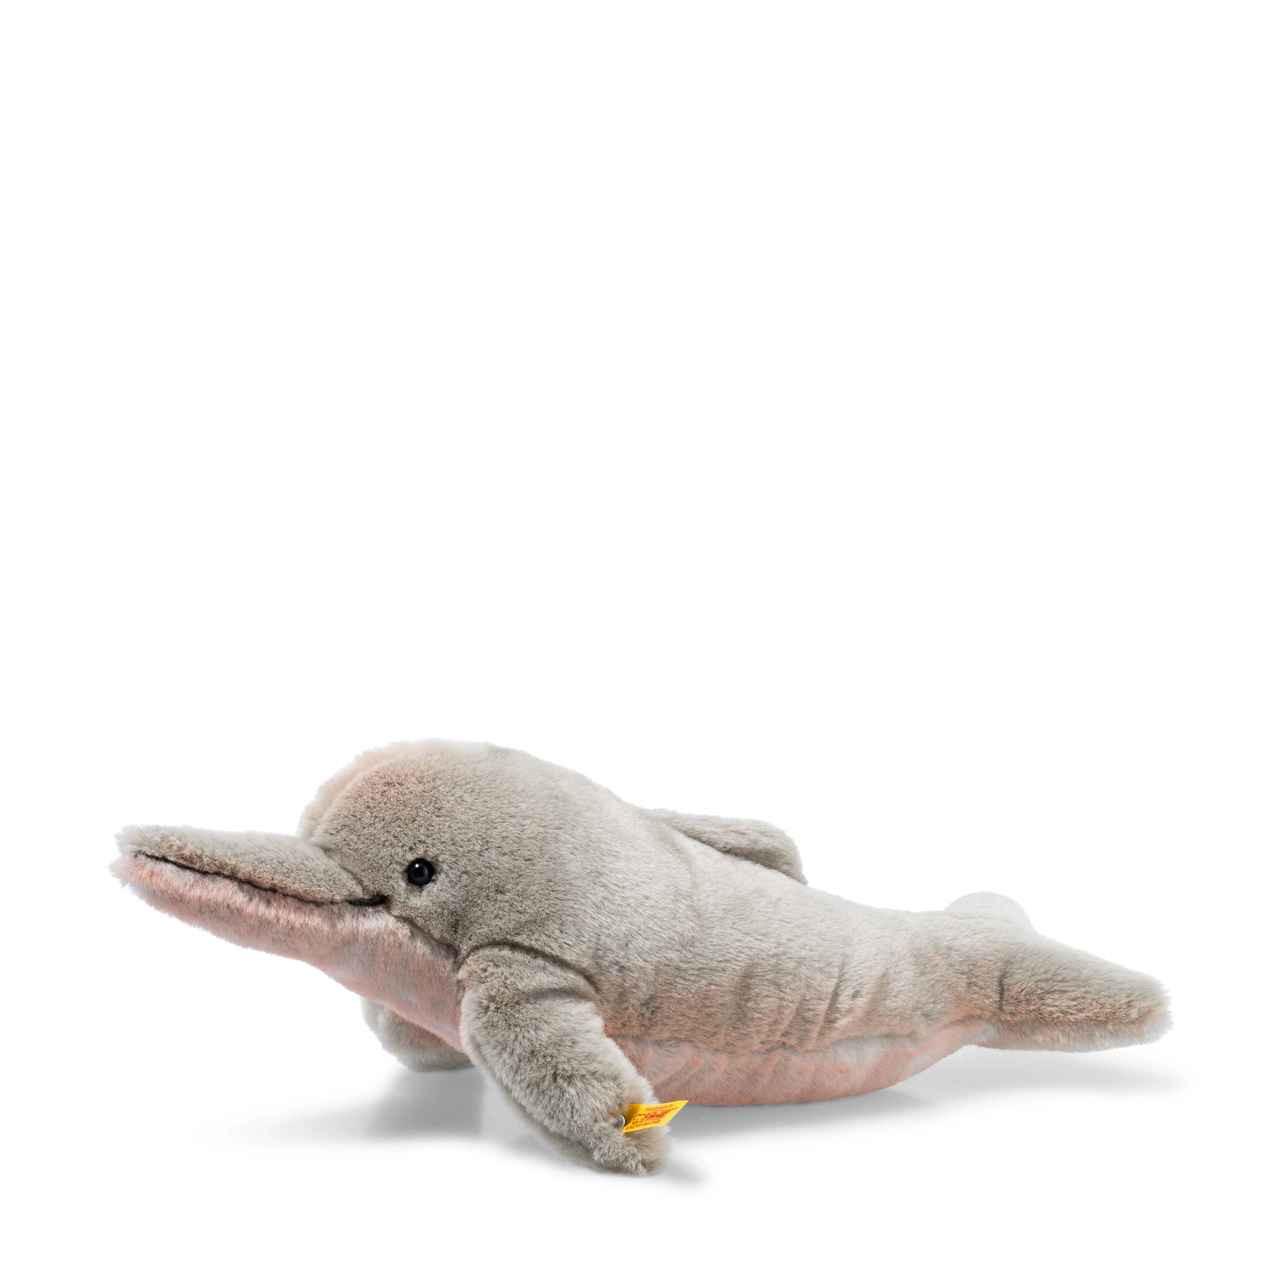 Stuffed Animals Protect Me Amazi Amazon River Dolphin Steiff